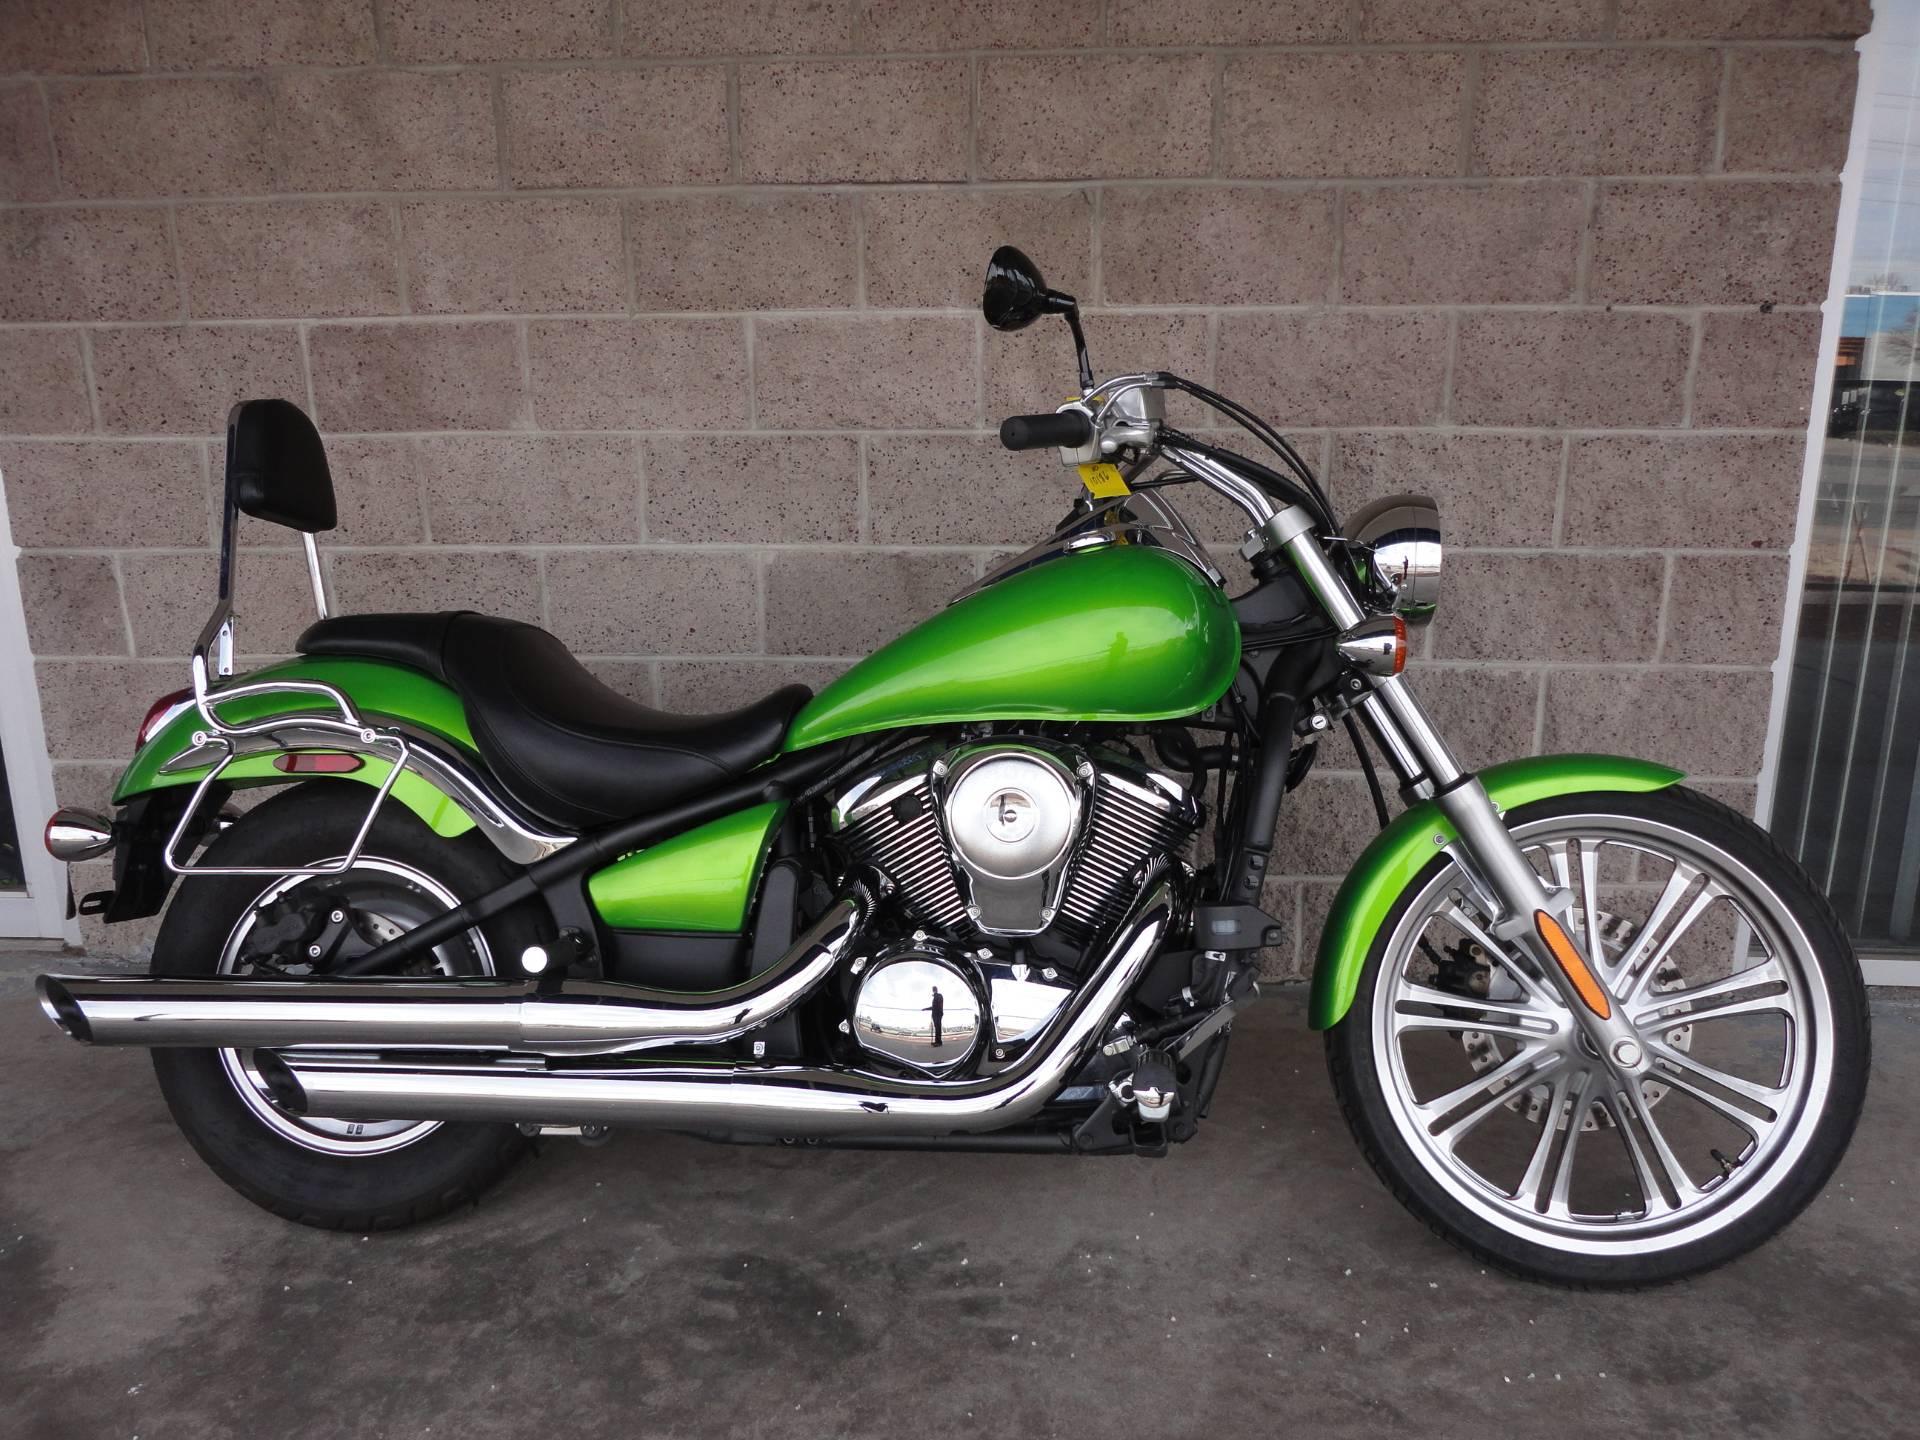 2008 kawasaki vulcan® 900 custom motorcycles denver colorado p9306